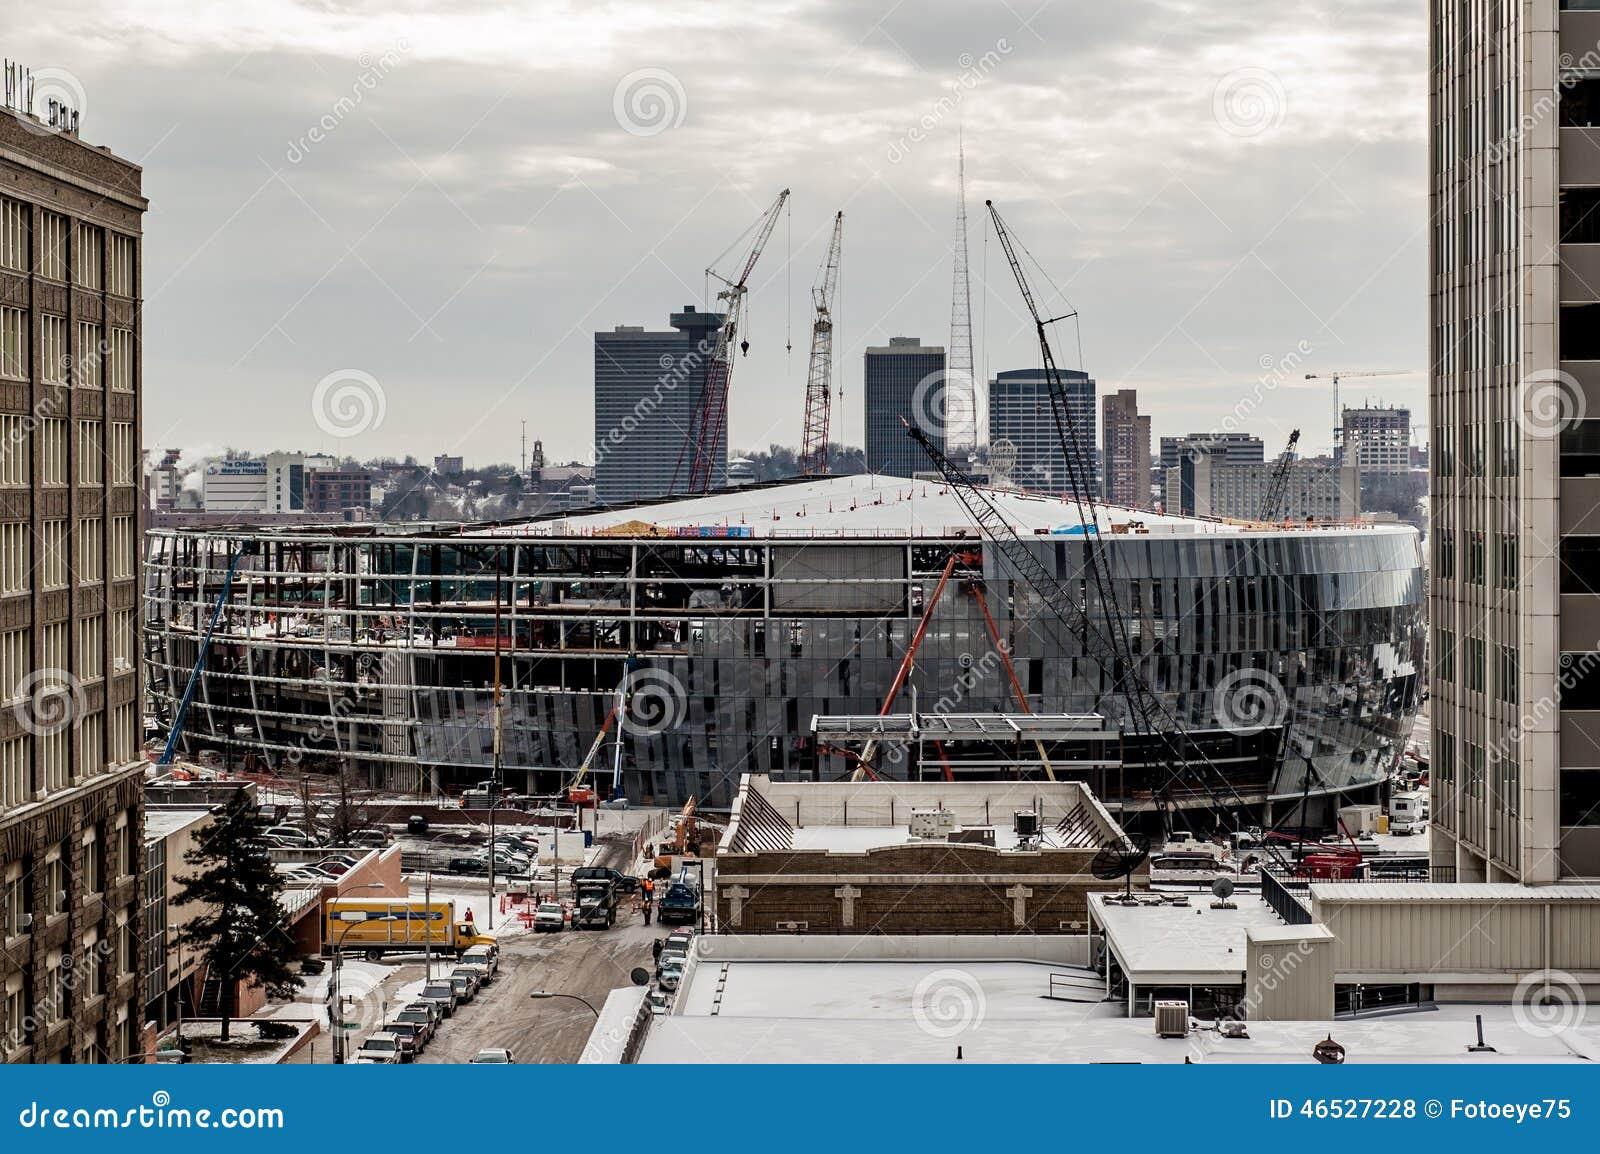 Facility Construction Missouri : Construction of sprint amphitheater in downtown kc kansas